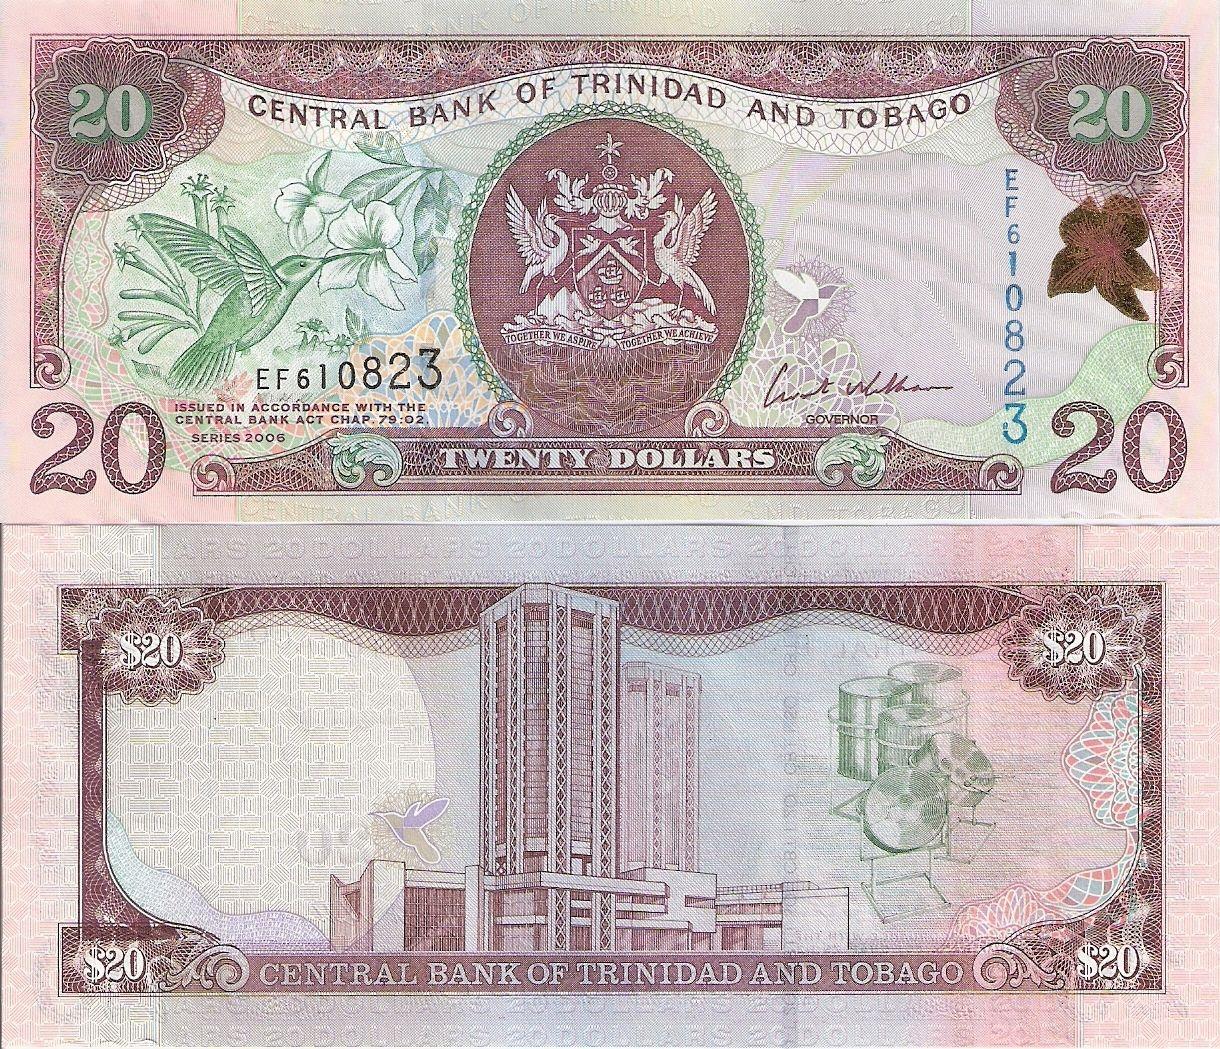 Trinidad 20 Dollars Banknote World Currency North